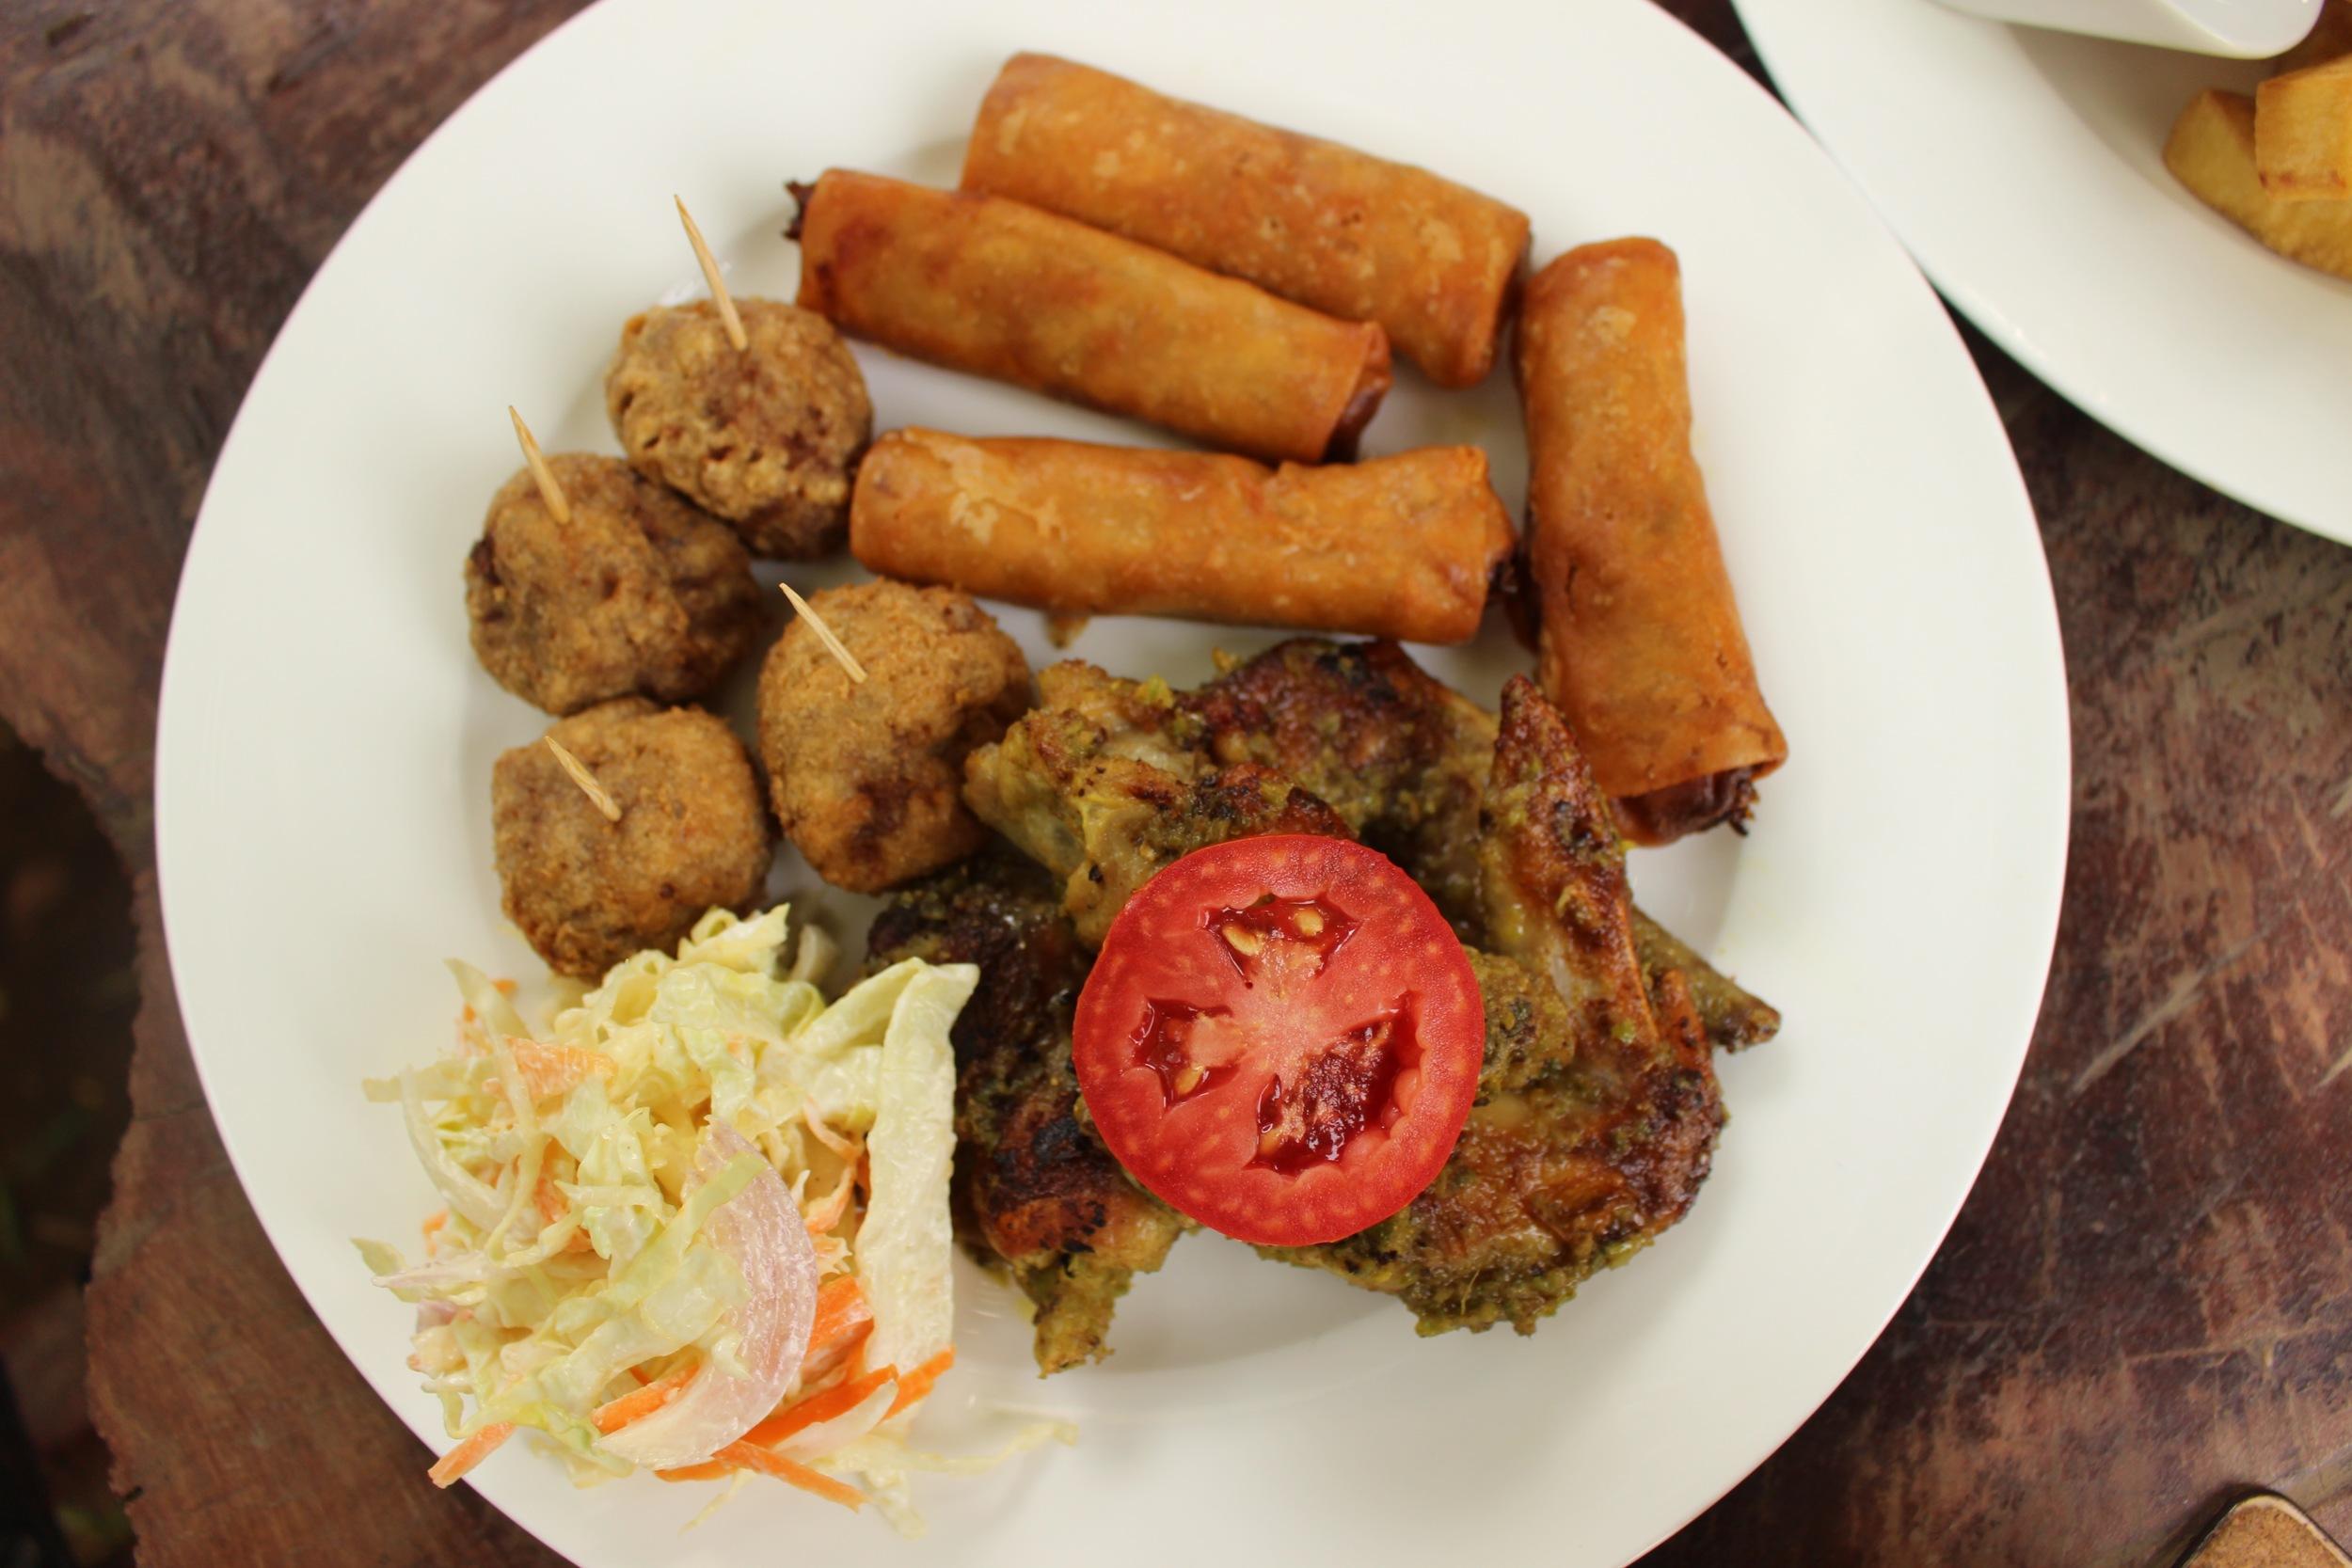 The Meat Platter, One Corner